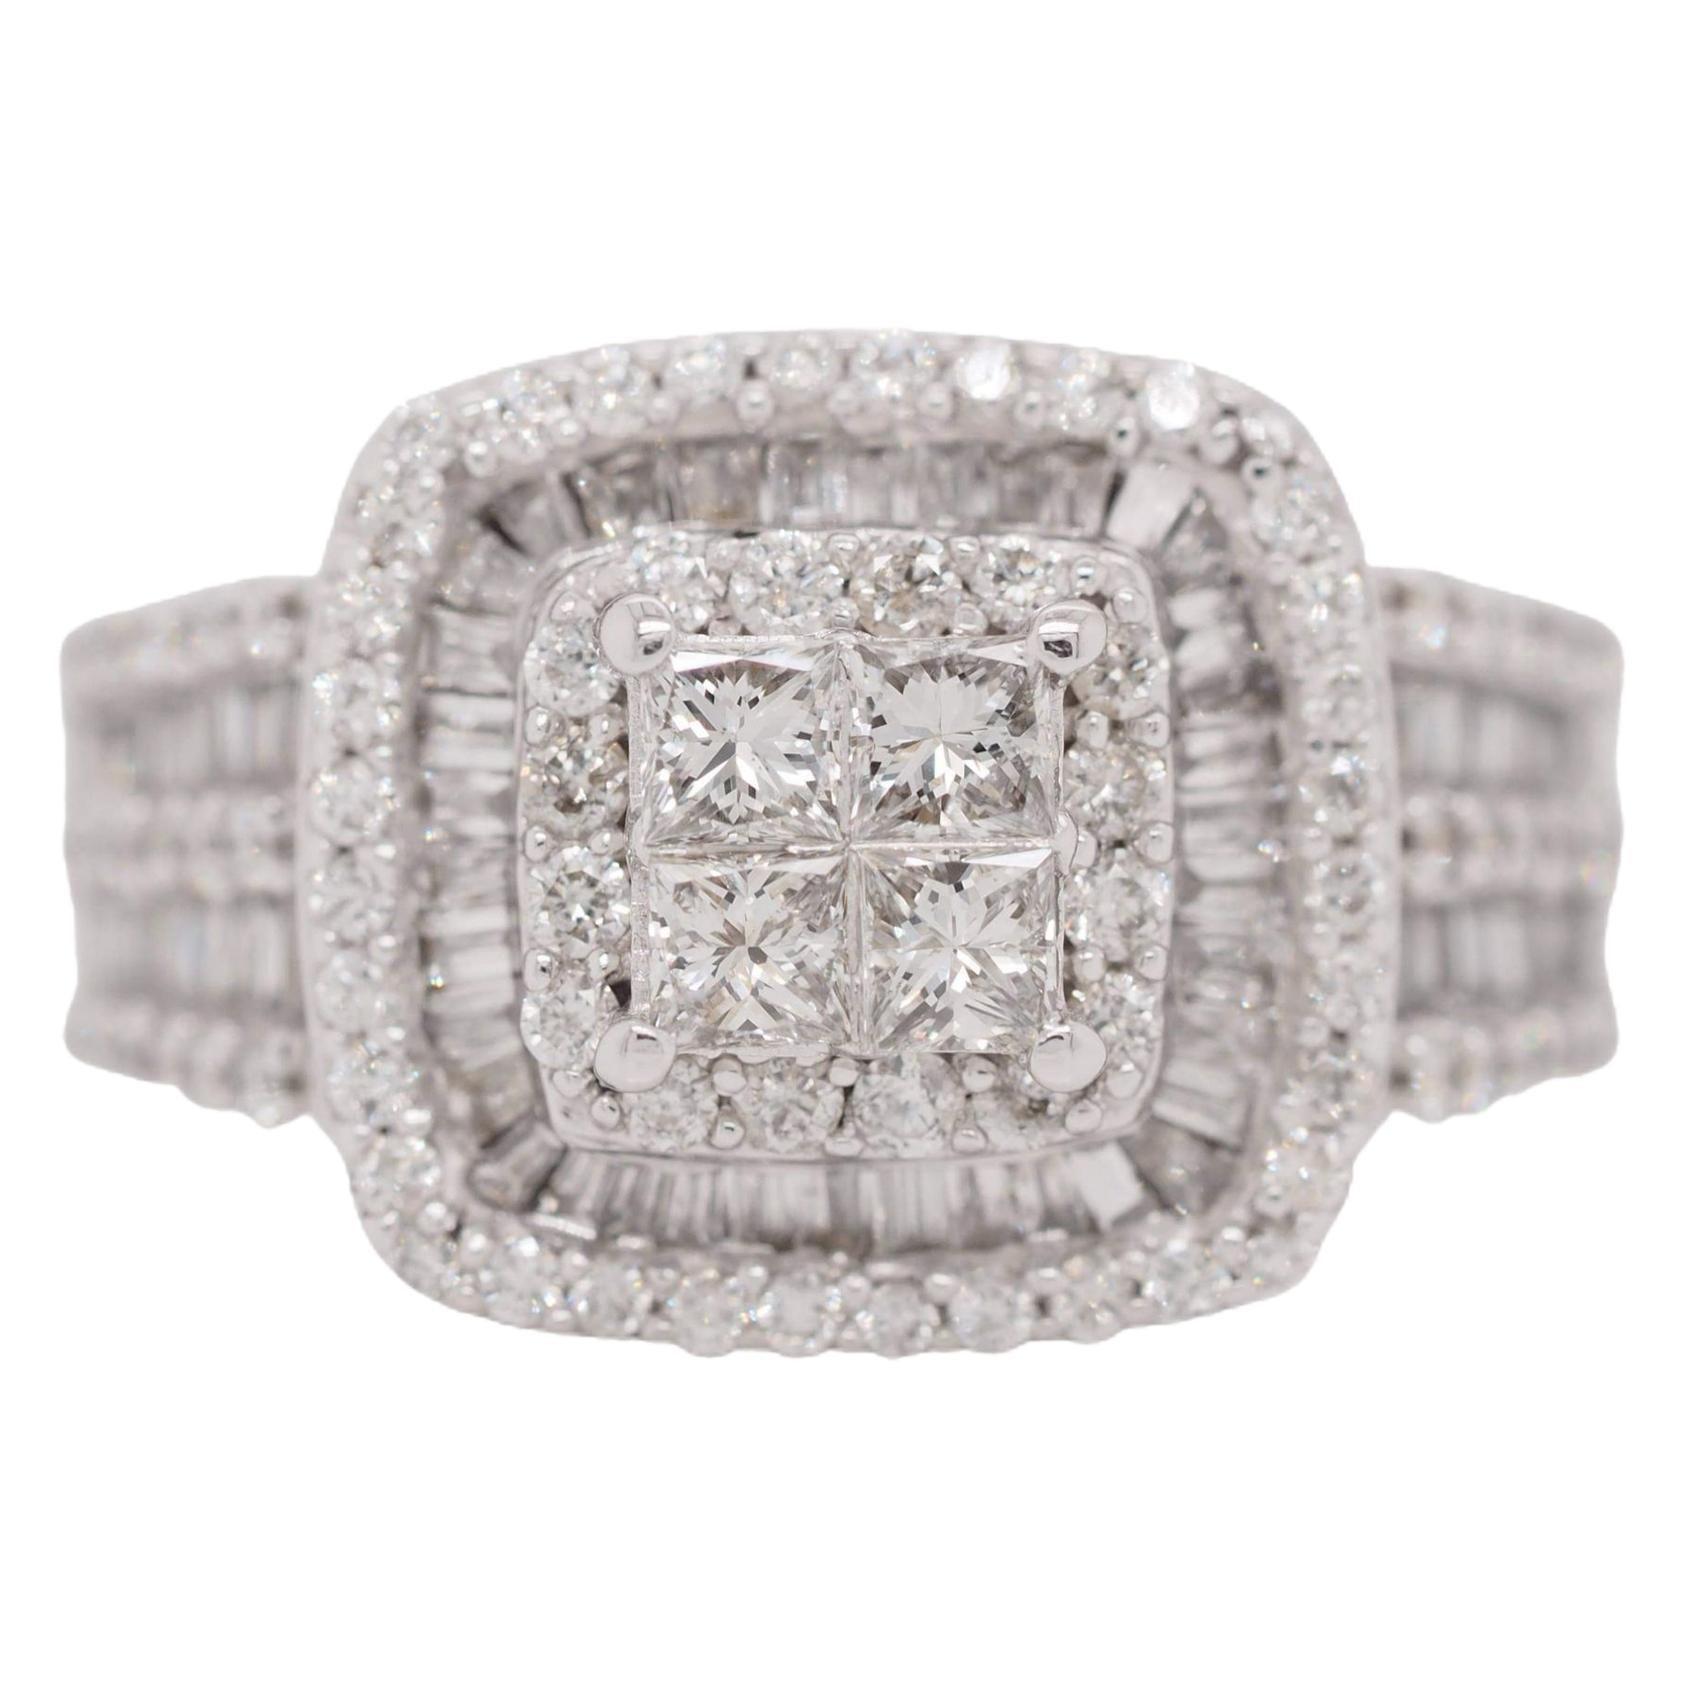 14 Karat White Gold Princess Cut Diamond Cluster Halo Style Engagement Ring